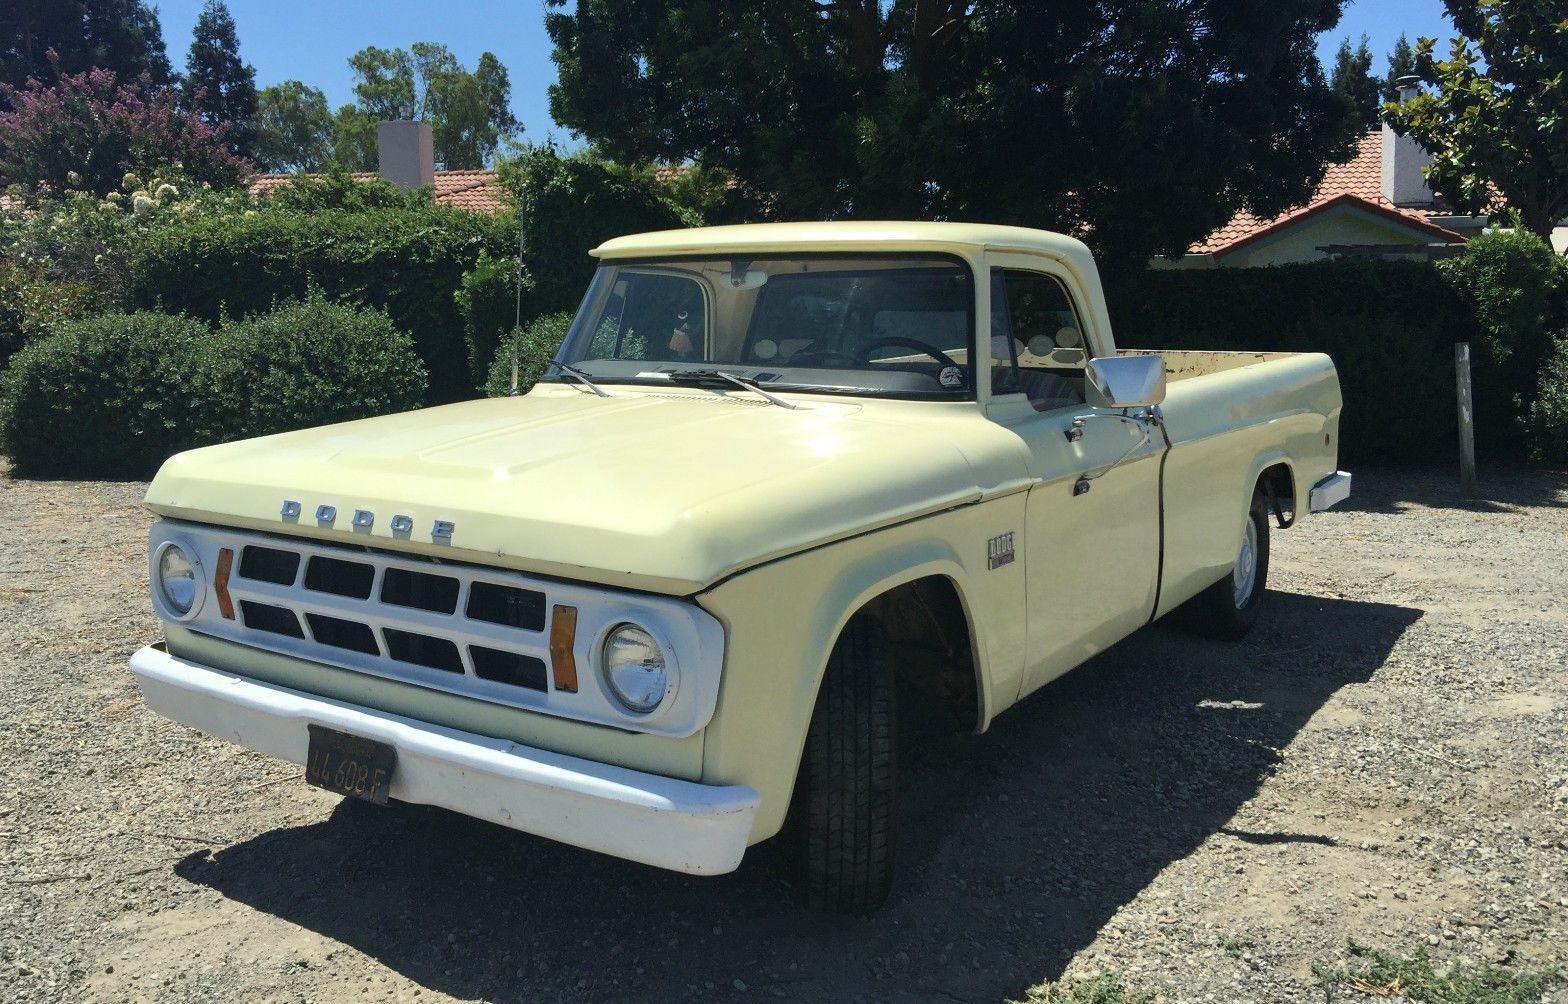 Another Honest Truck: 1969 Dodge D100